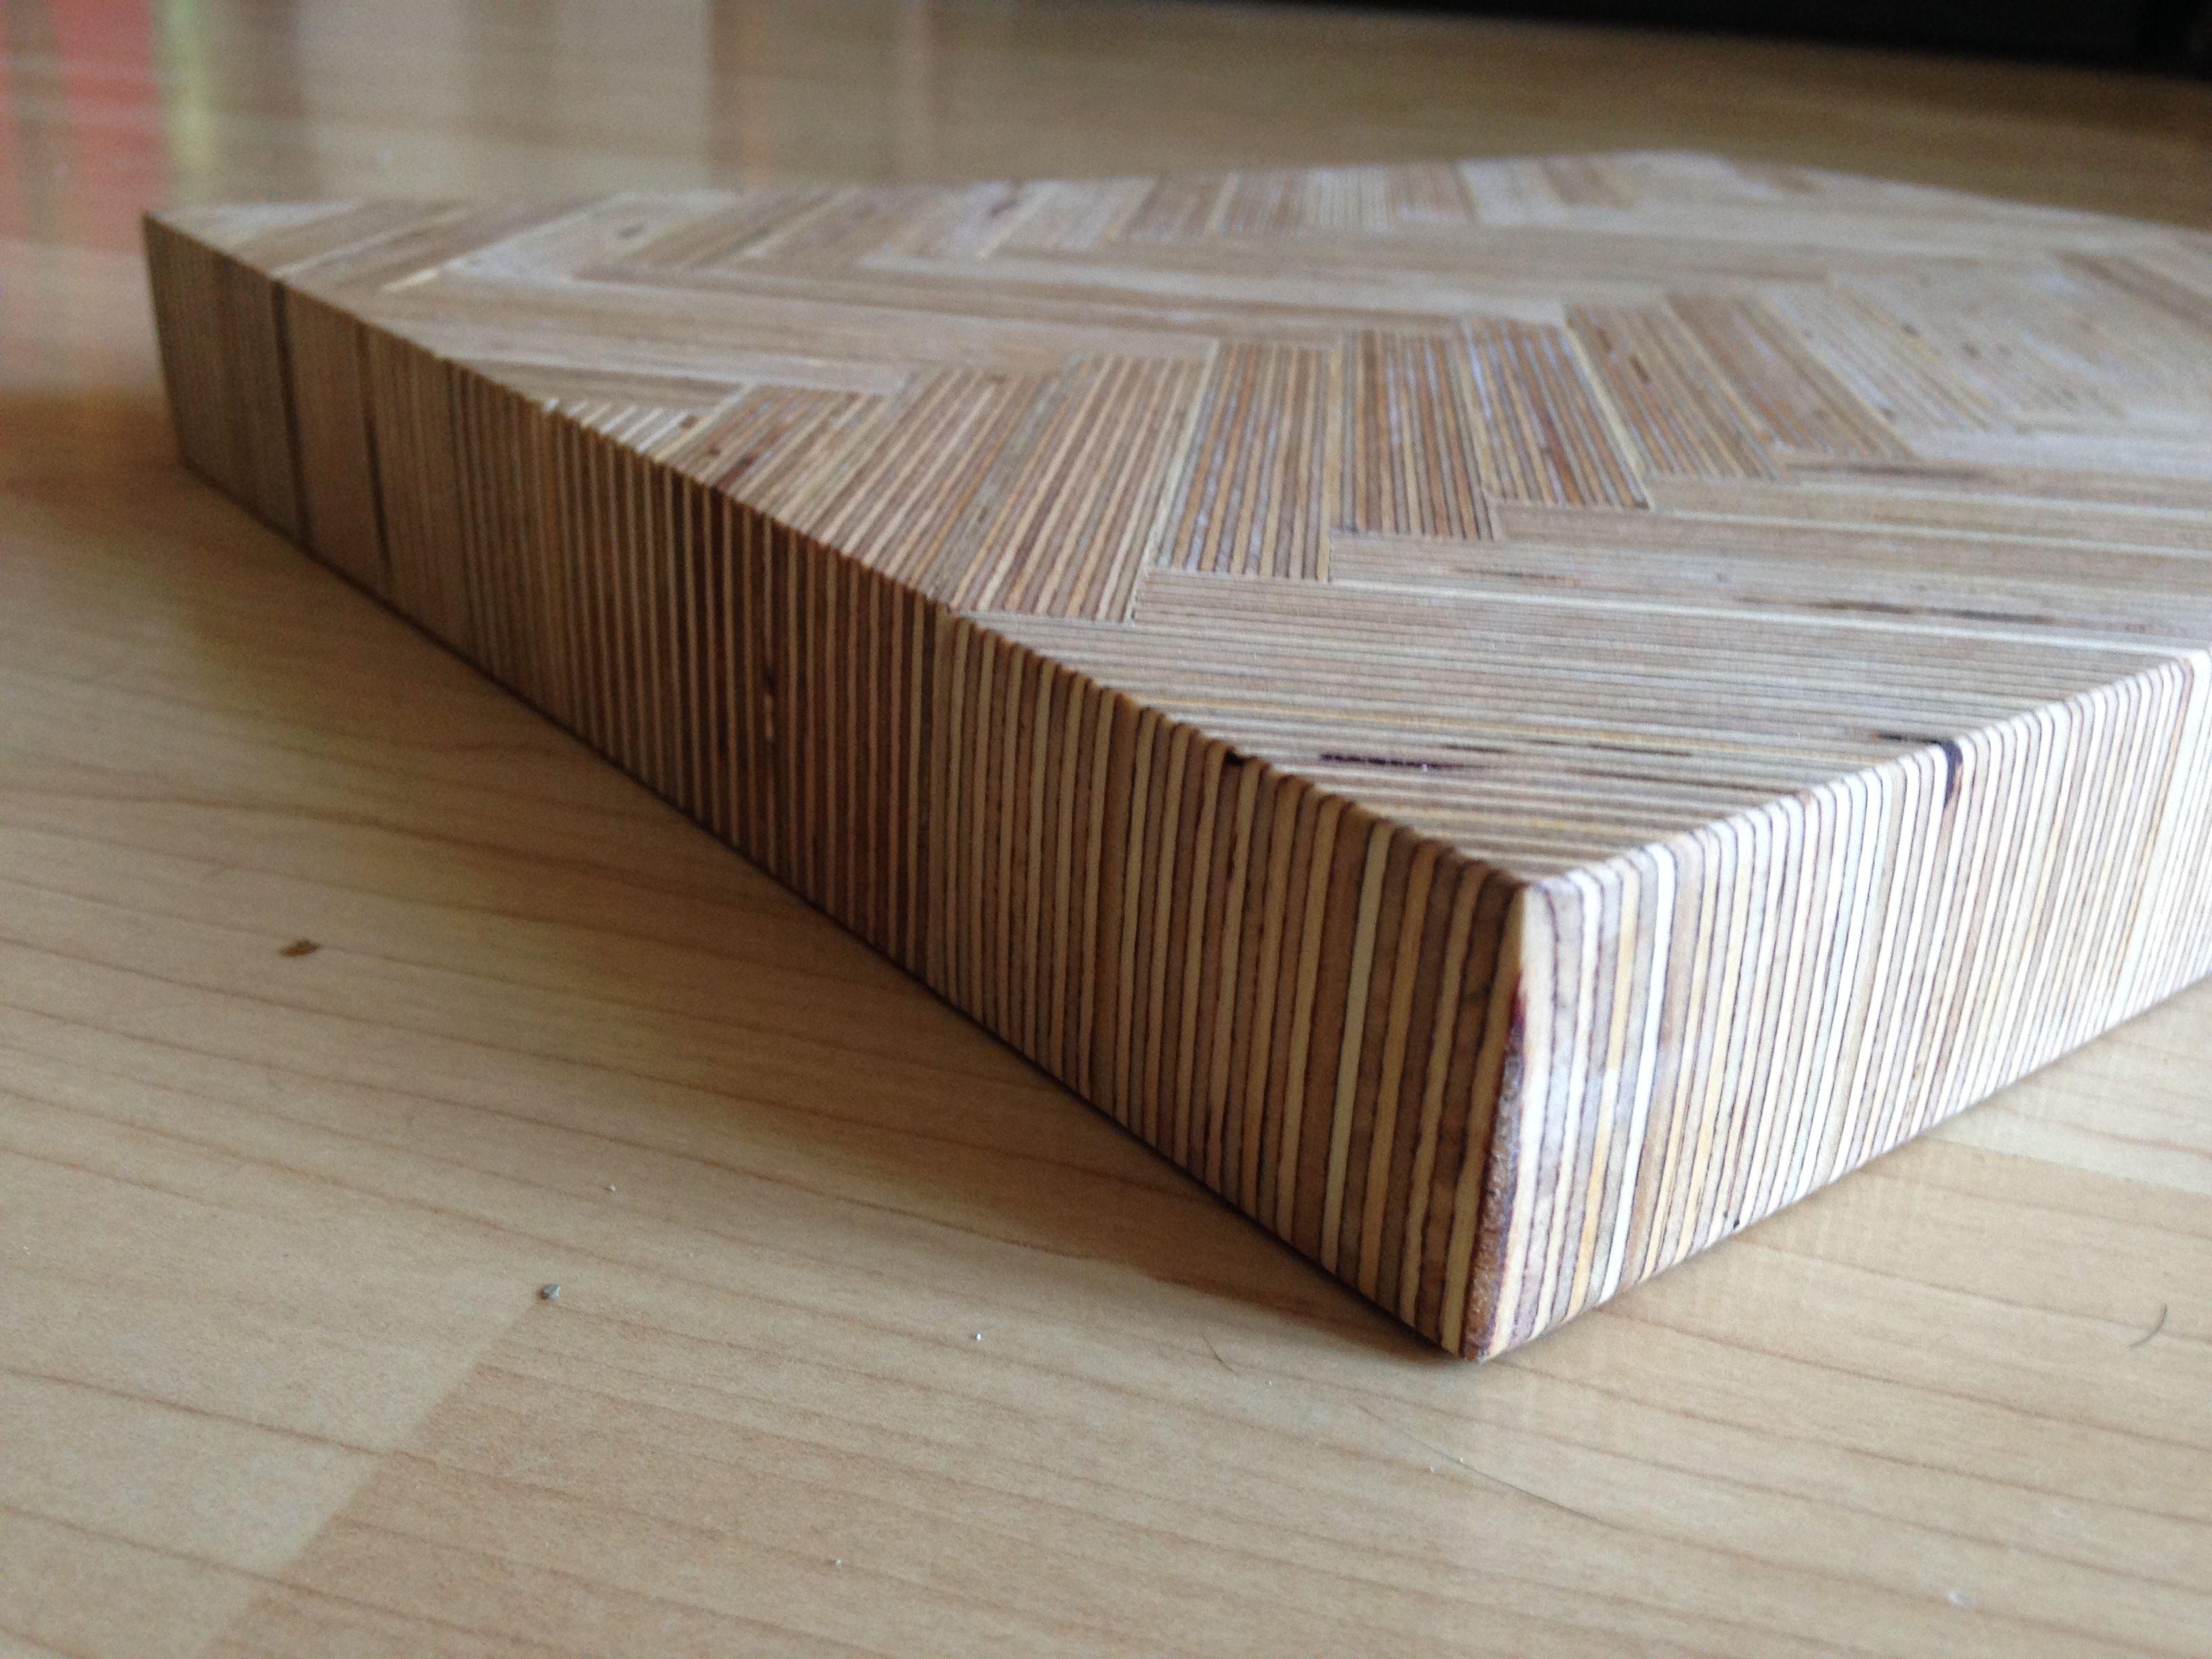 Whitewashed Plywood Table Plywood Table Plywood Desk Plywood